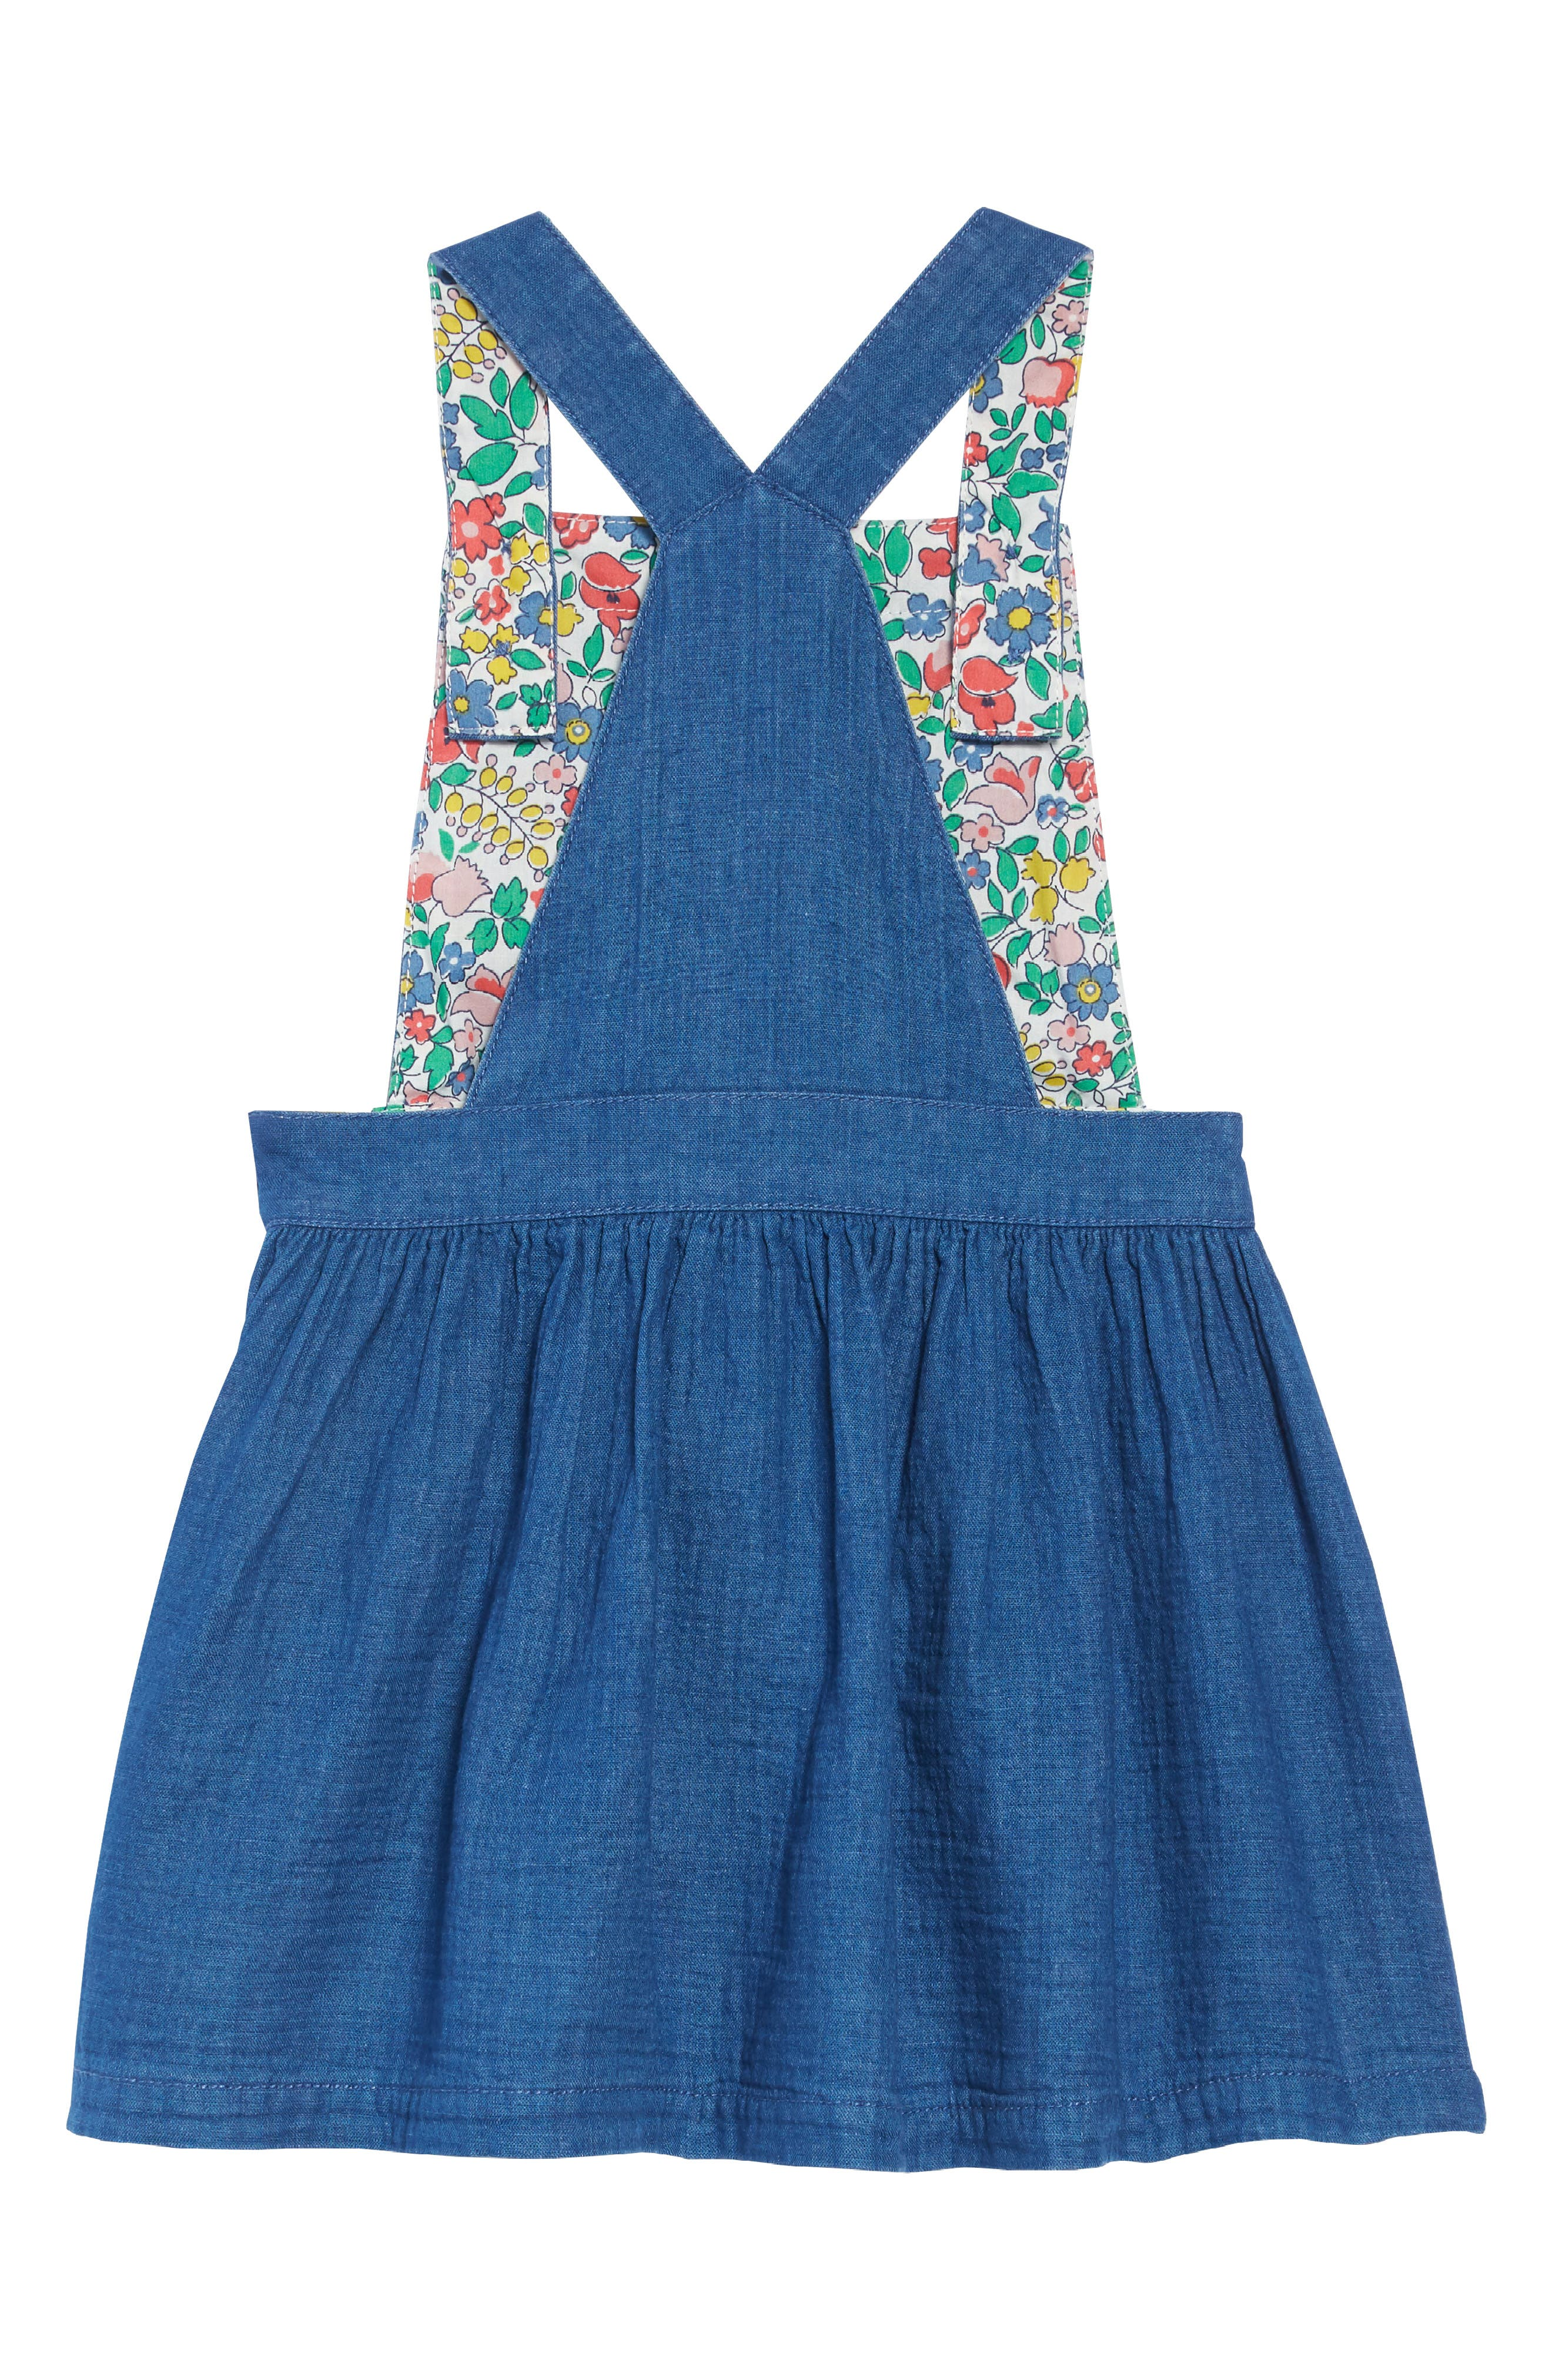 Dungaree Overall Dress,                             Alternate thumbnail 2, color,                             INDIGO BLUE